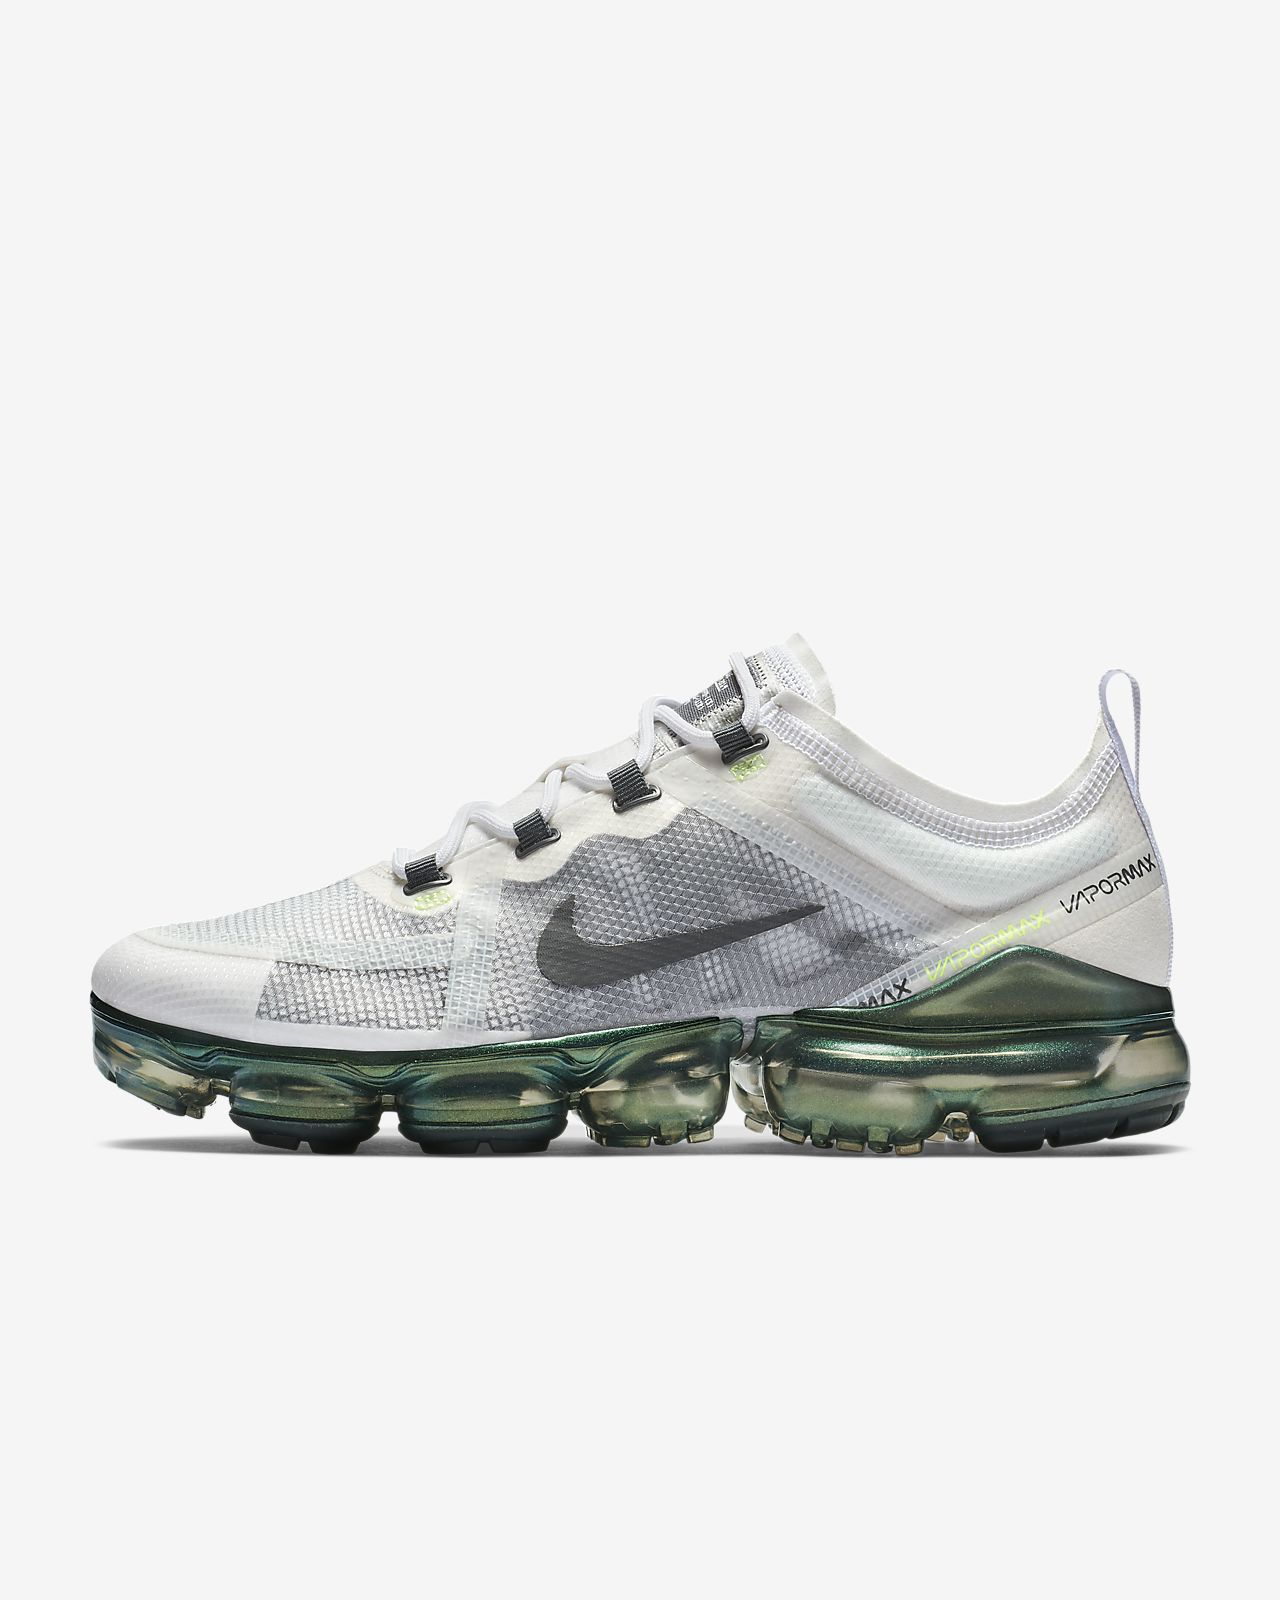 e63ffa268251 Nike Air VaporMax 2019 Premium Shoe. Nike.com CA